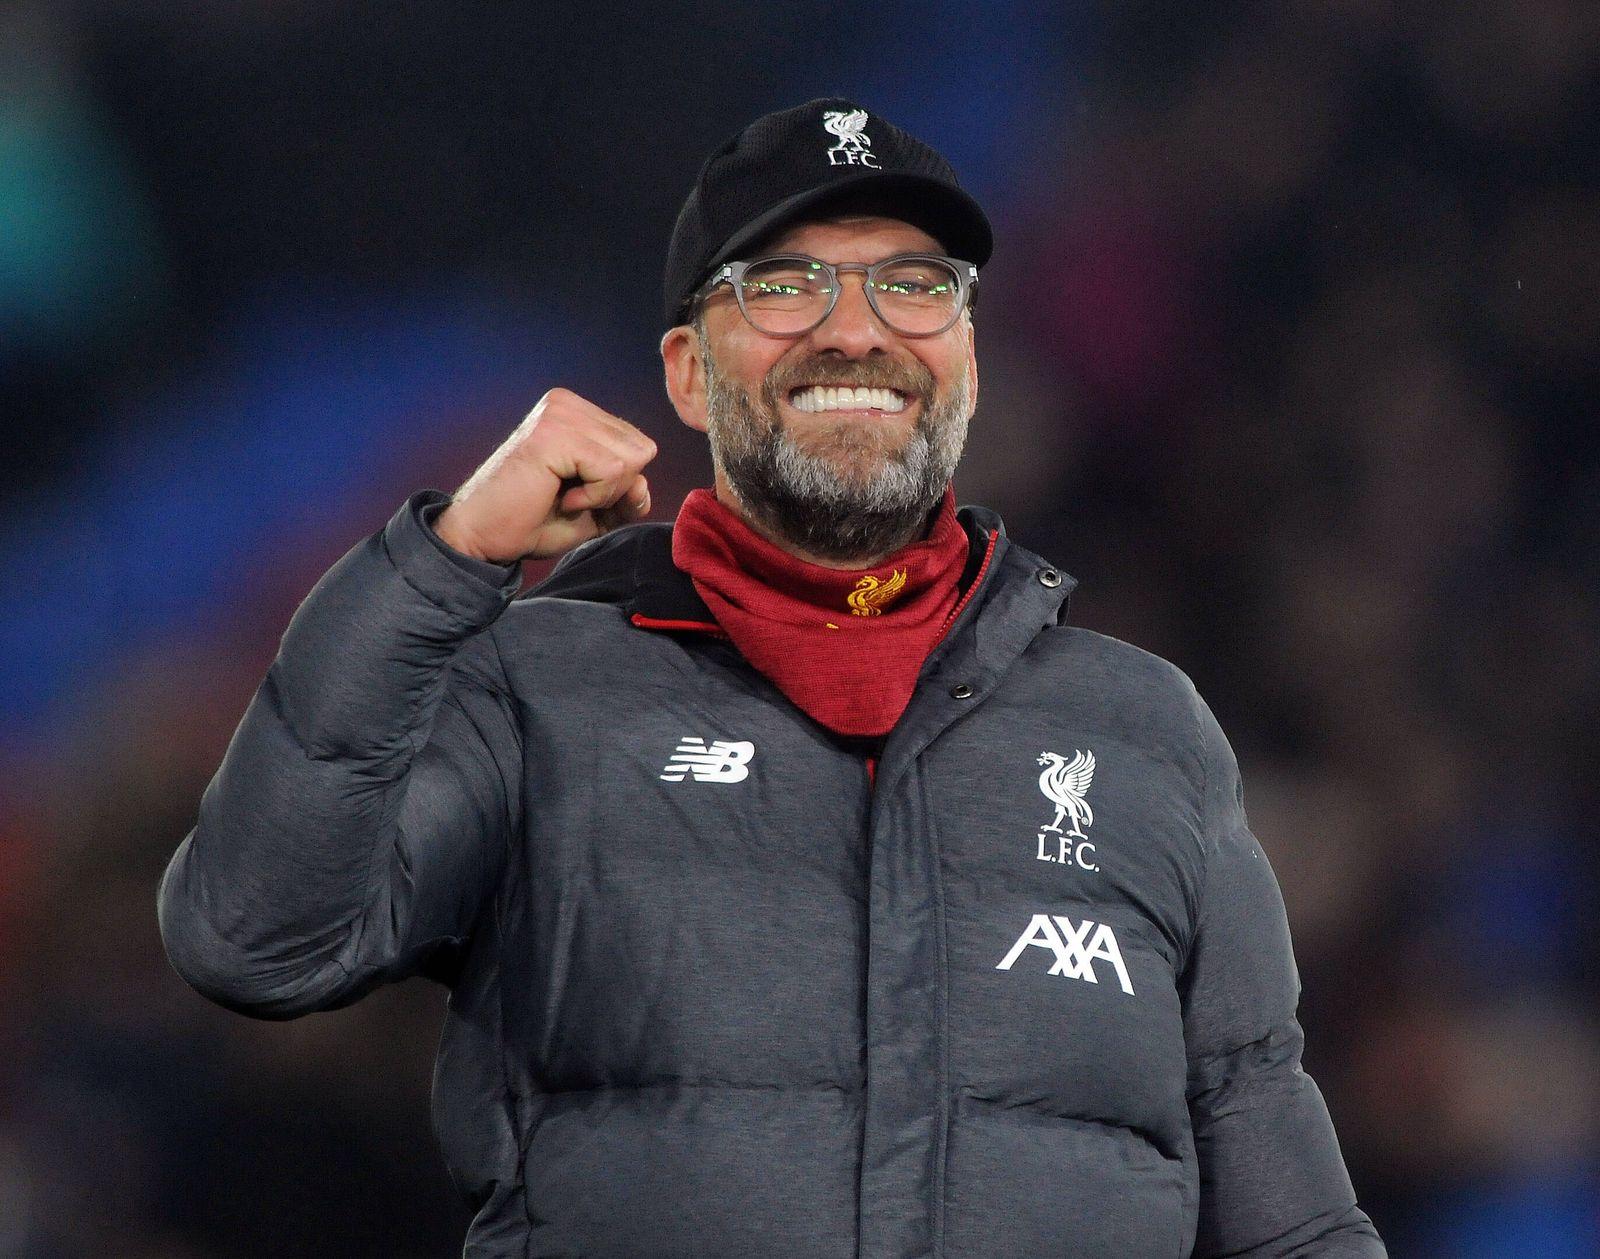 Sport Bilder des Tages Football - 2019 / 2020 Premier League - Crystal Palace vs. Liverpool Liverpool Manager, Jurgen K